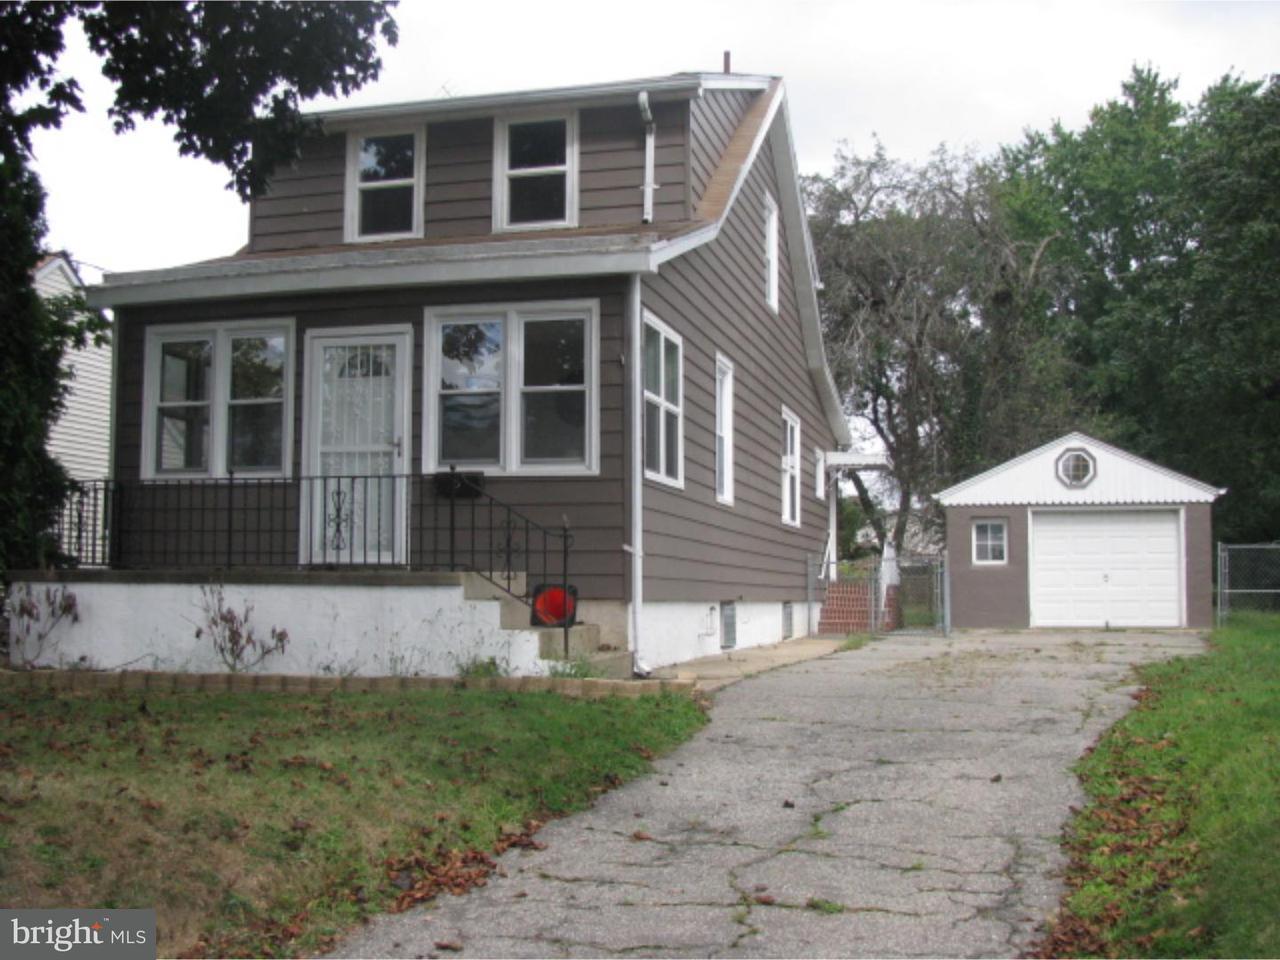 Single Family Home for Rent at 2060 S OLDEN Avenue Hamilton Township, New Jersey 08610 United StatesMunicipality: Hamilton Township